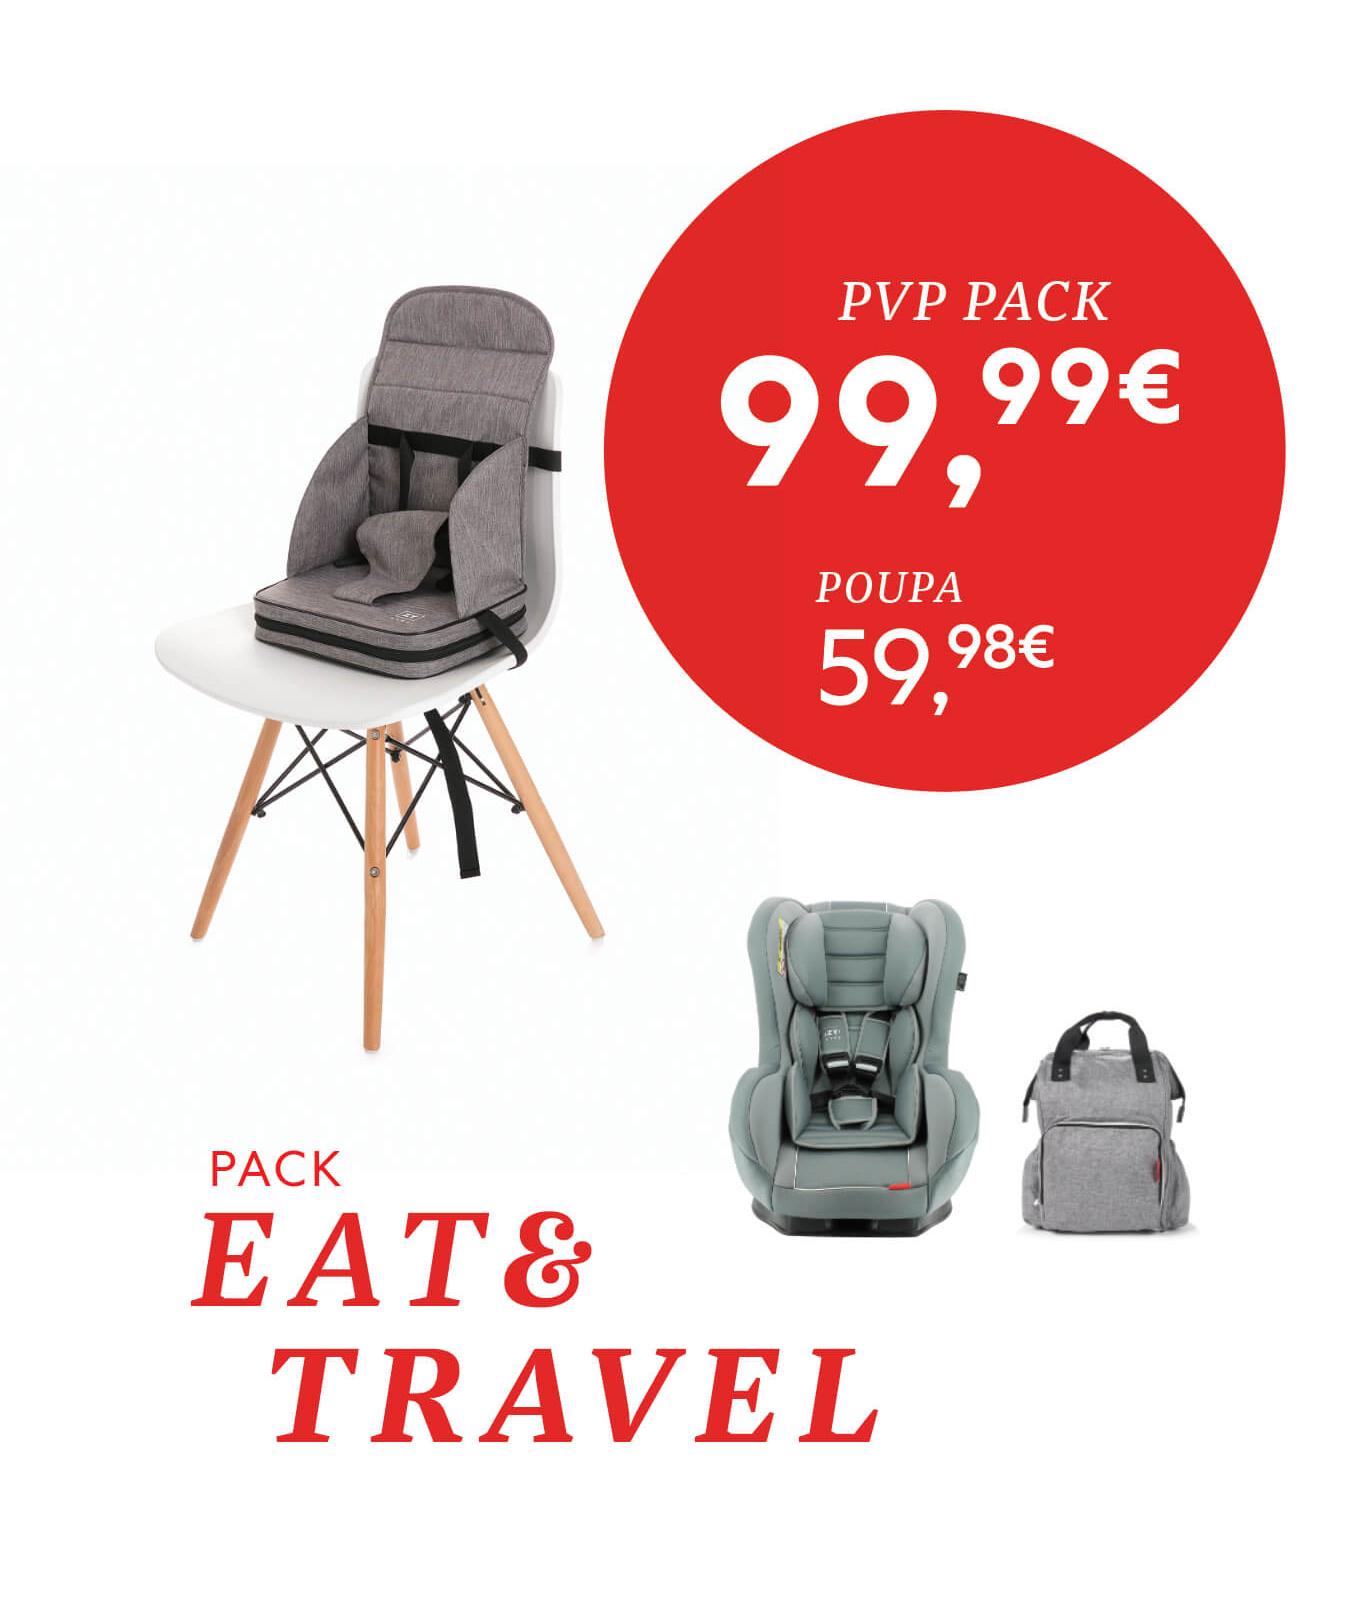 Save Money Eat & Travel